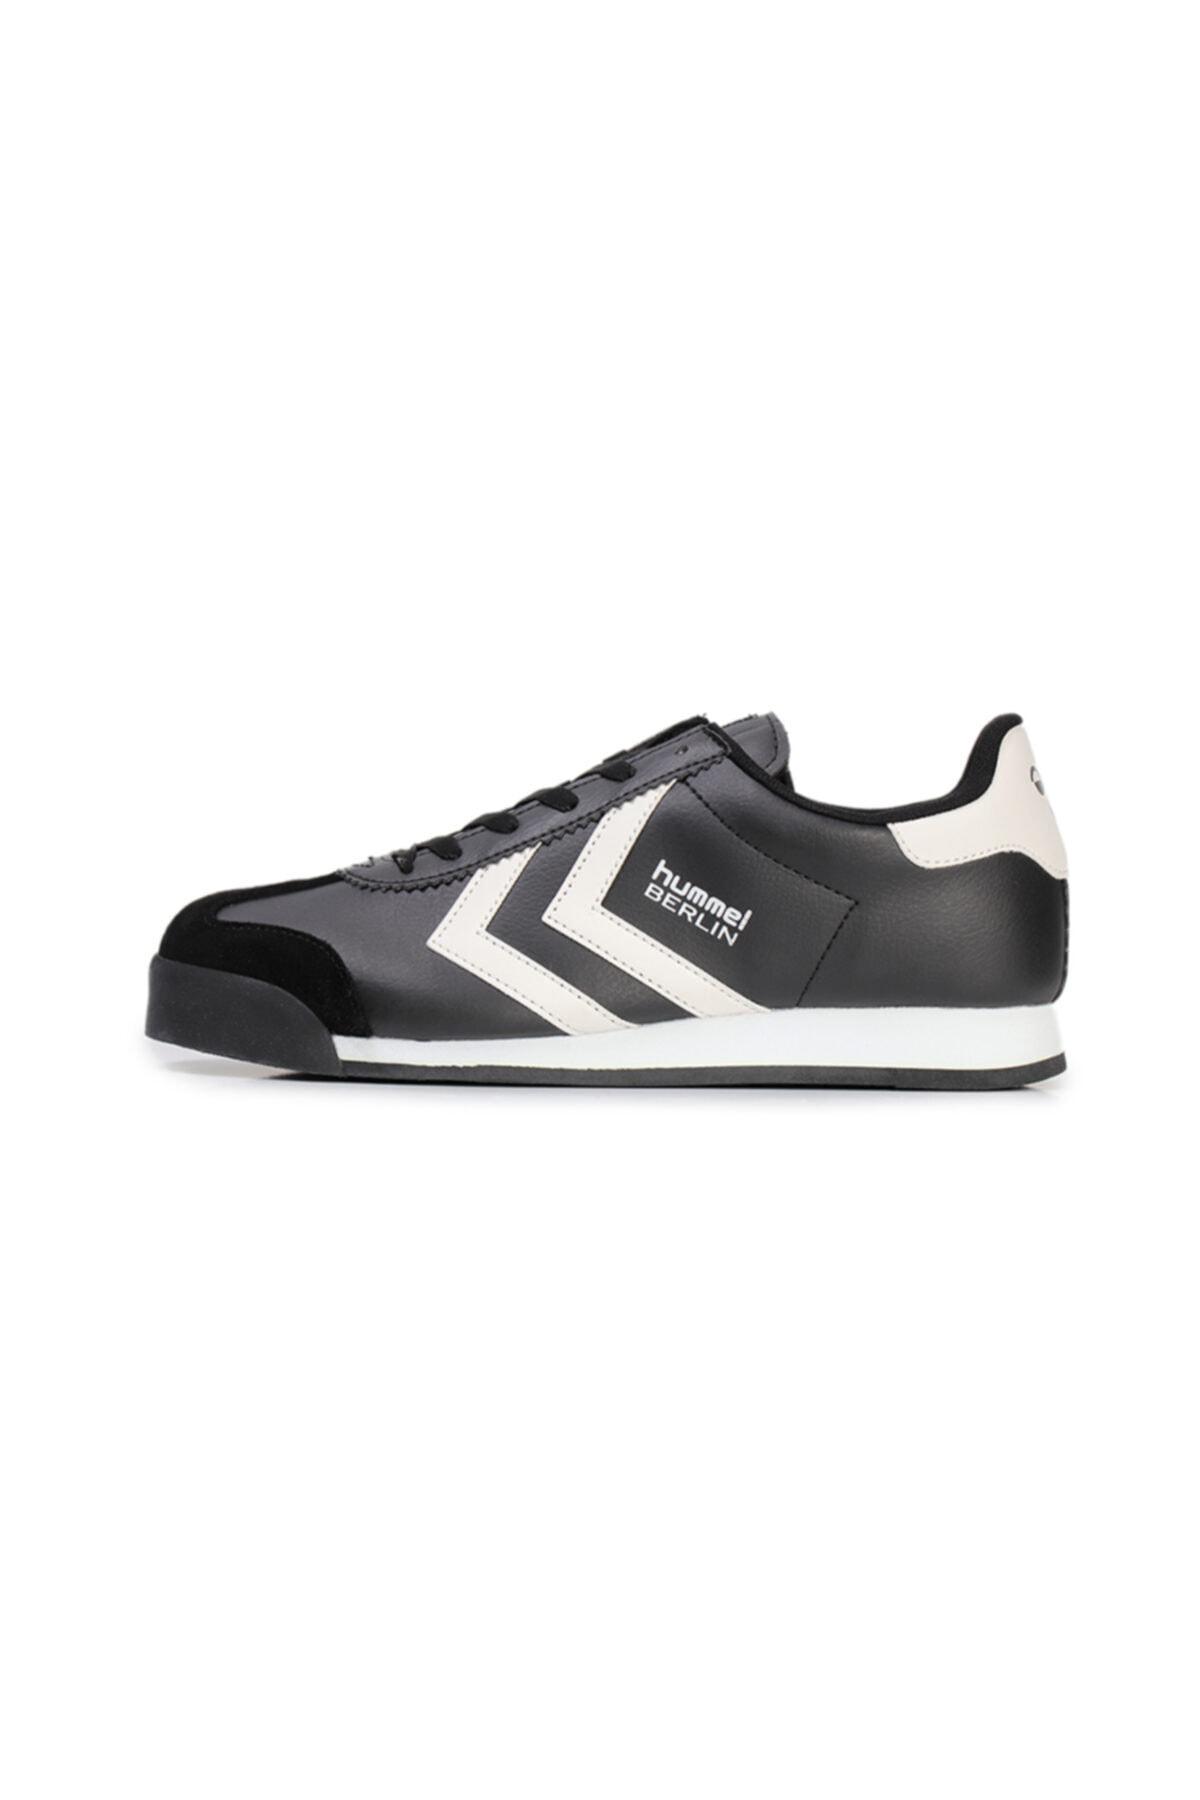 HUMMEL Berlin Sneaker Siyah Gri Erkek Sneaker Ayakkabı 100433126 1